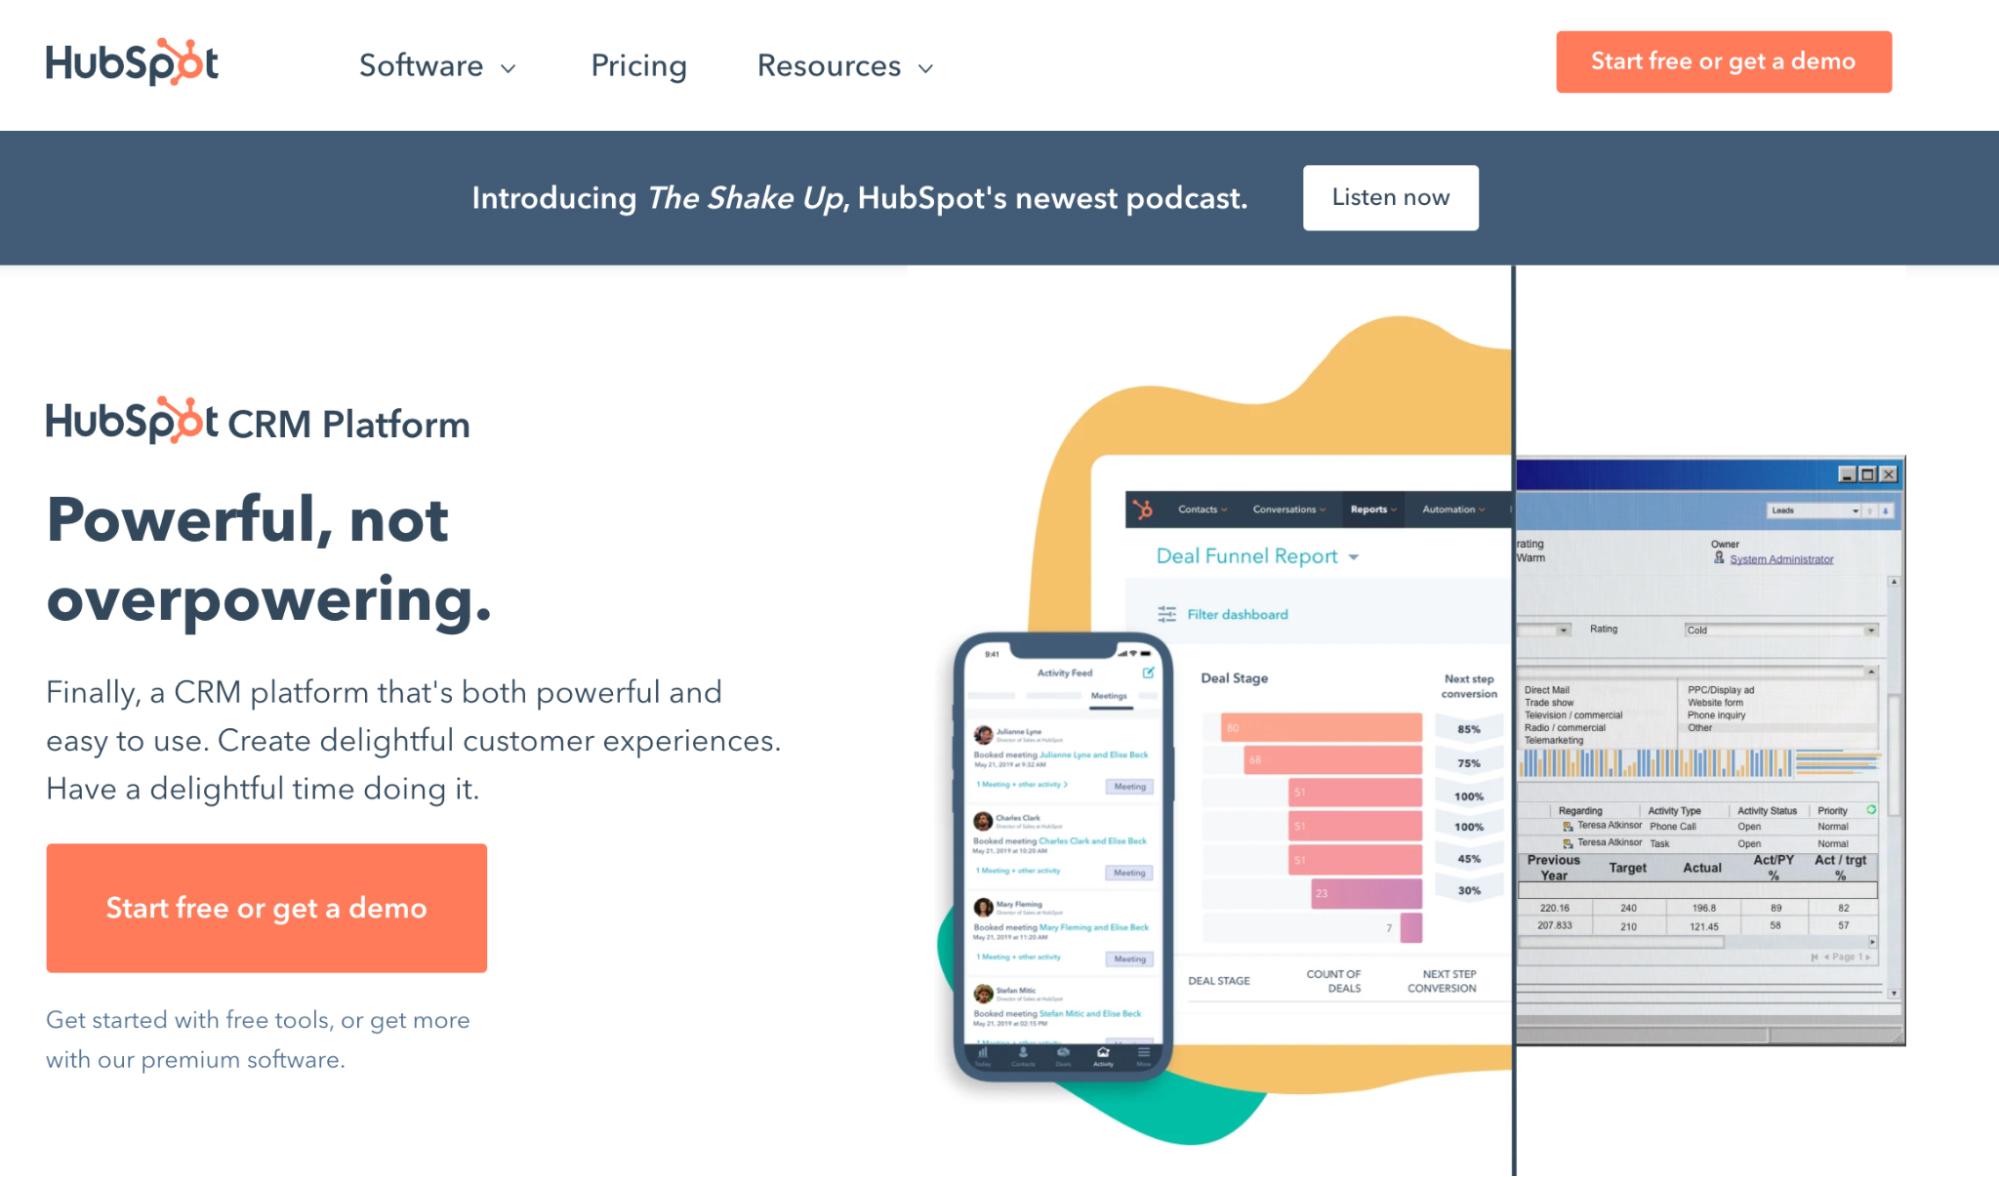 SaaS Marketing Automation Tools: HubSpot Screenshot